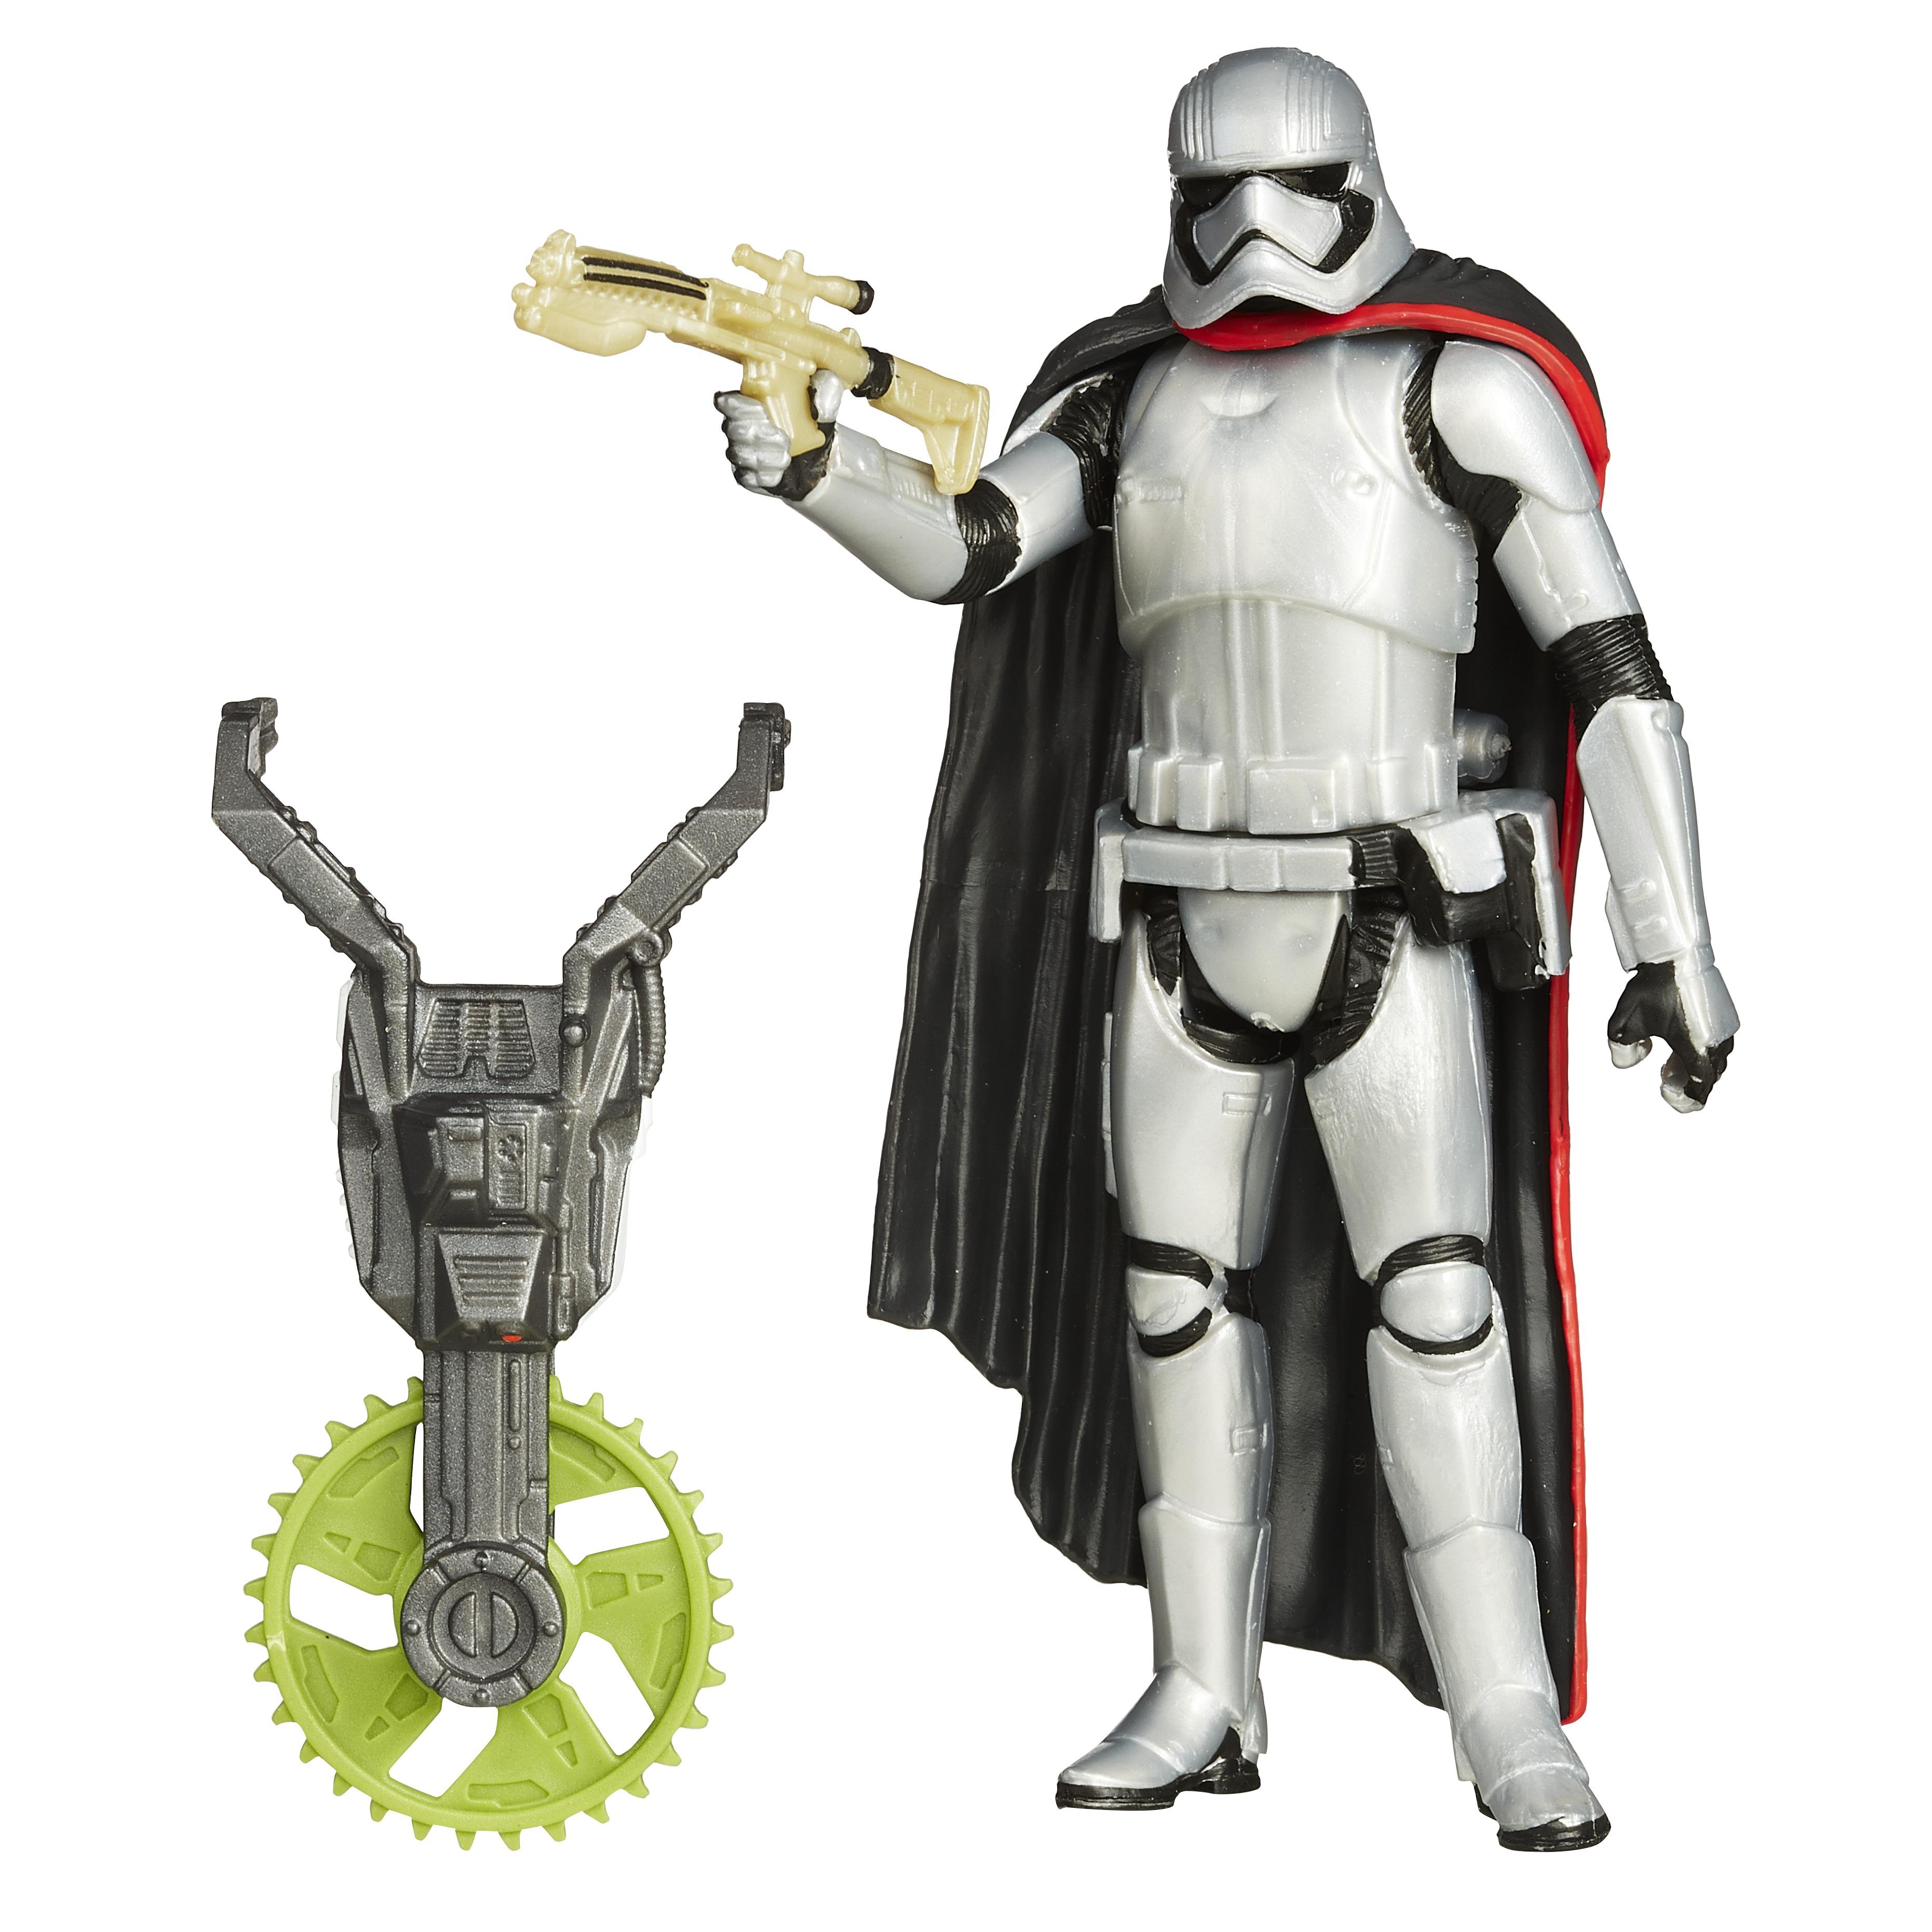 <b>Star Wars <i>The Force Awakens</i> Build a Weapon</b>; Capt. Phasma